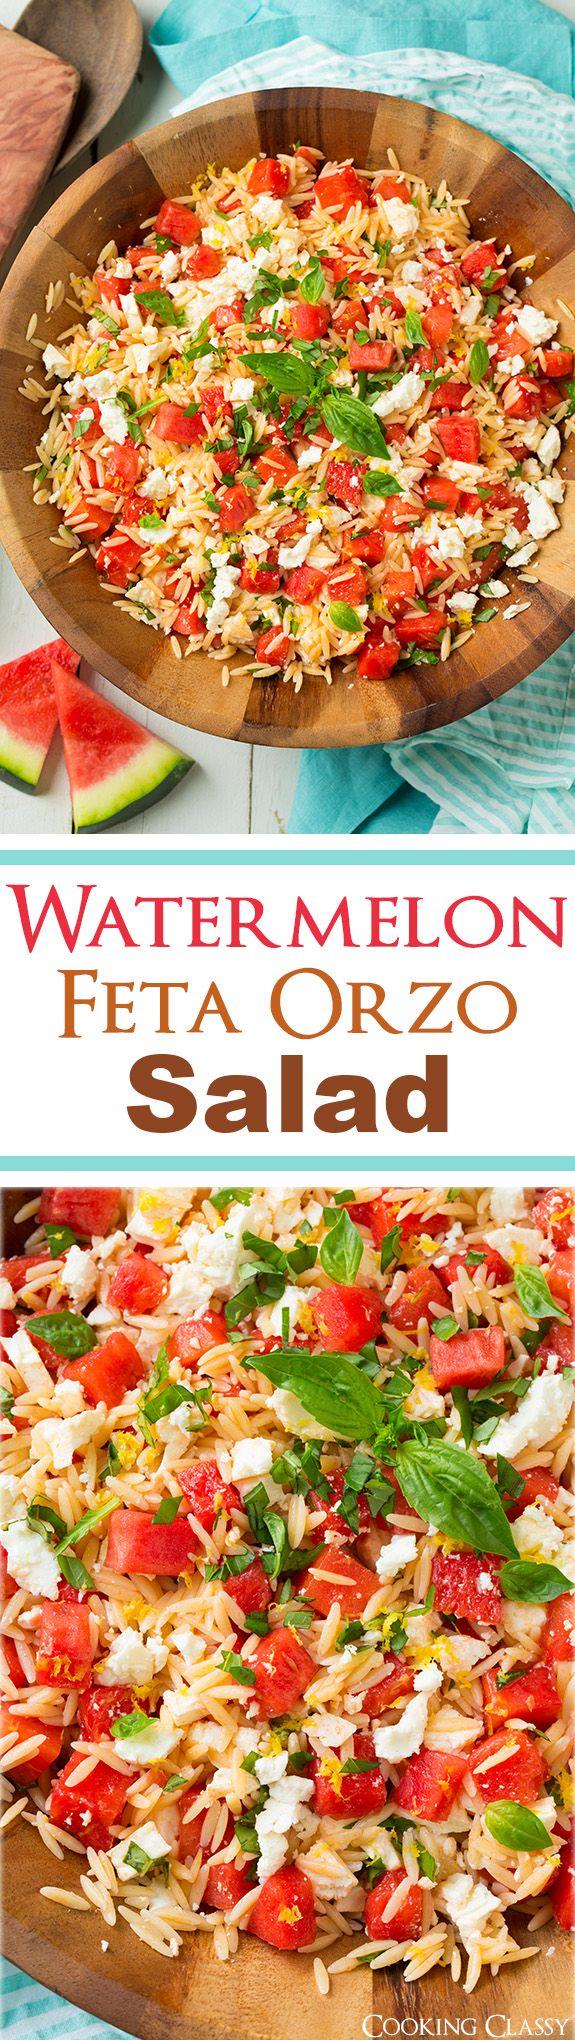 ... Feta Salad, Substitute Watermelon, Tomato Watermelon Salad, Watermelon